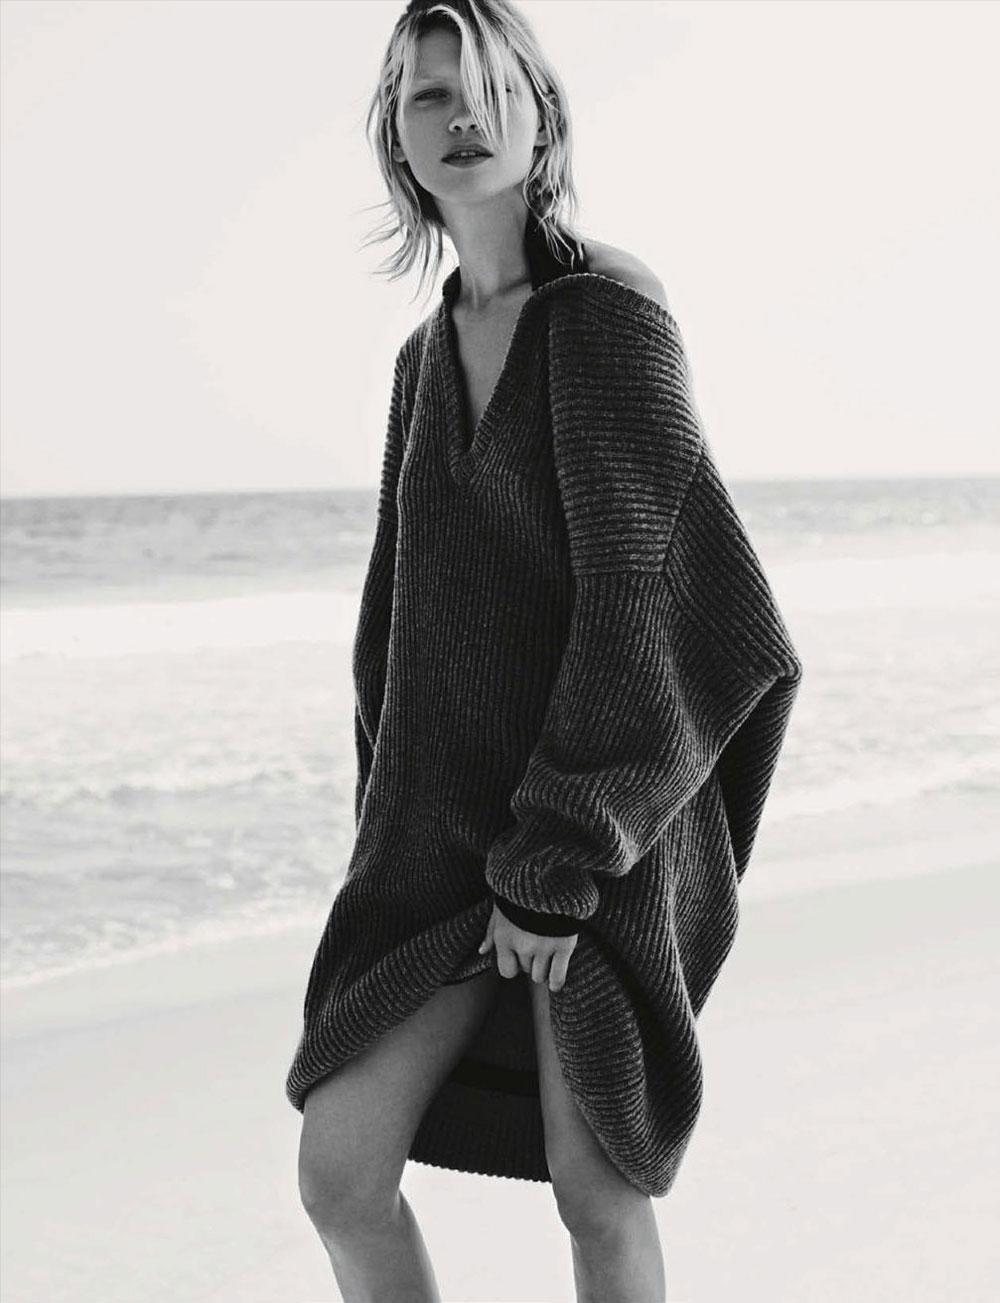 Vogue-Germany-November-2014-Hana-Jirickova-Nick-Dorey-Oracle-Fox-3.jpg